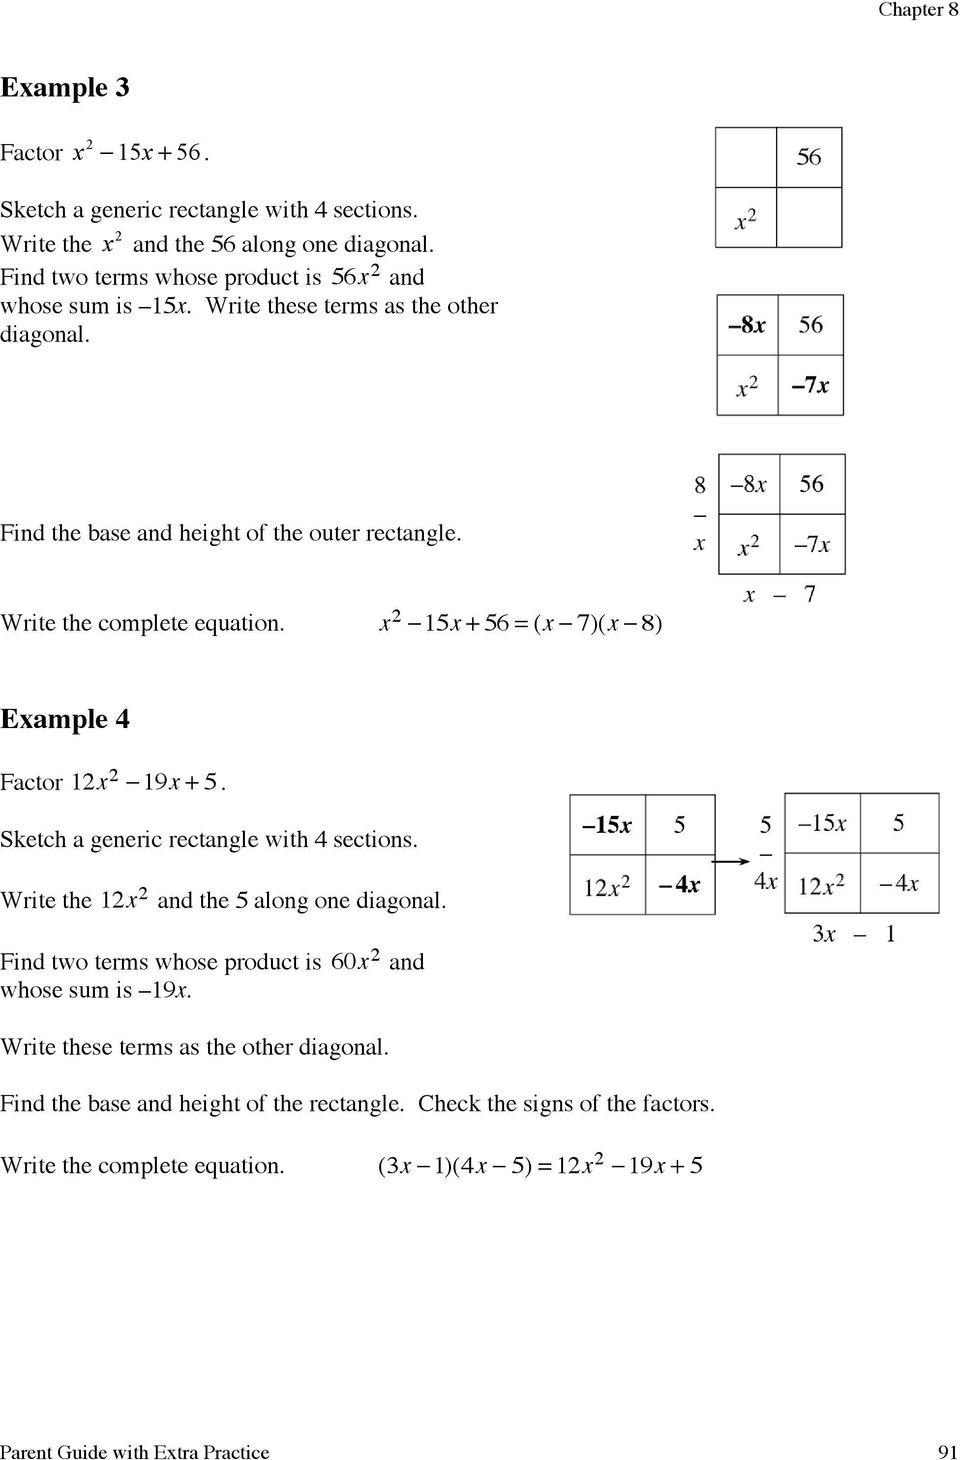 Factoring Special Cases Worksheet Factoring Quadratics Through Pdf Free Download